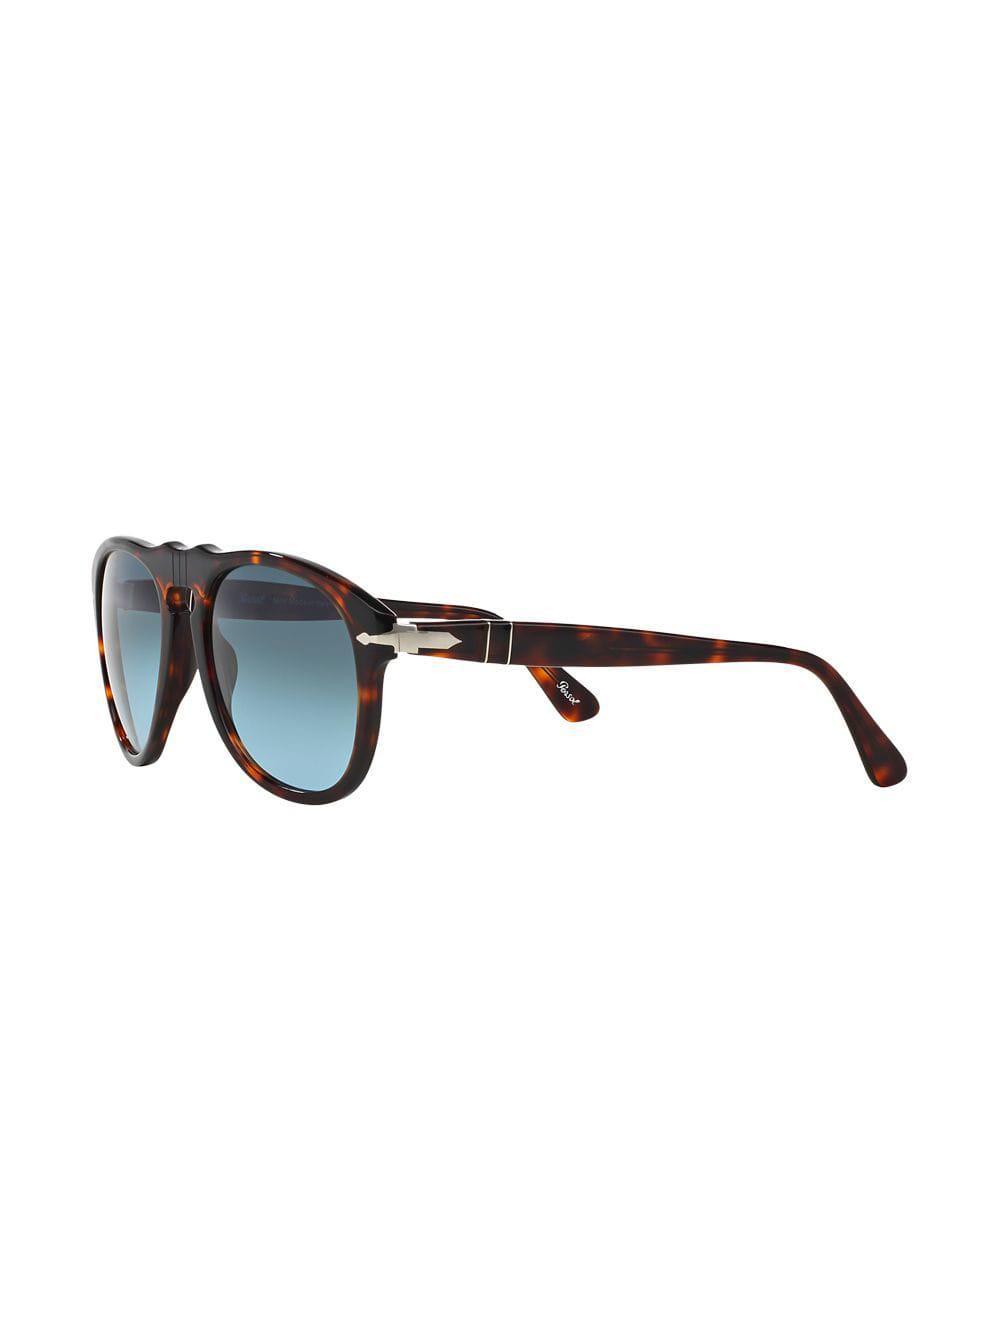 c6b4e698ef Persol Tortoiseshell-effect Round Sunglasses in Brown for Men - Lyst